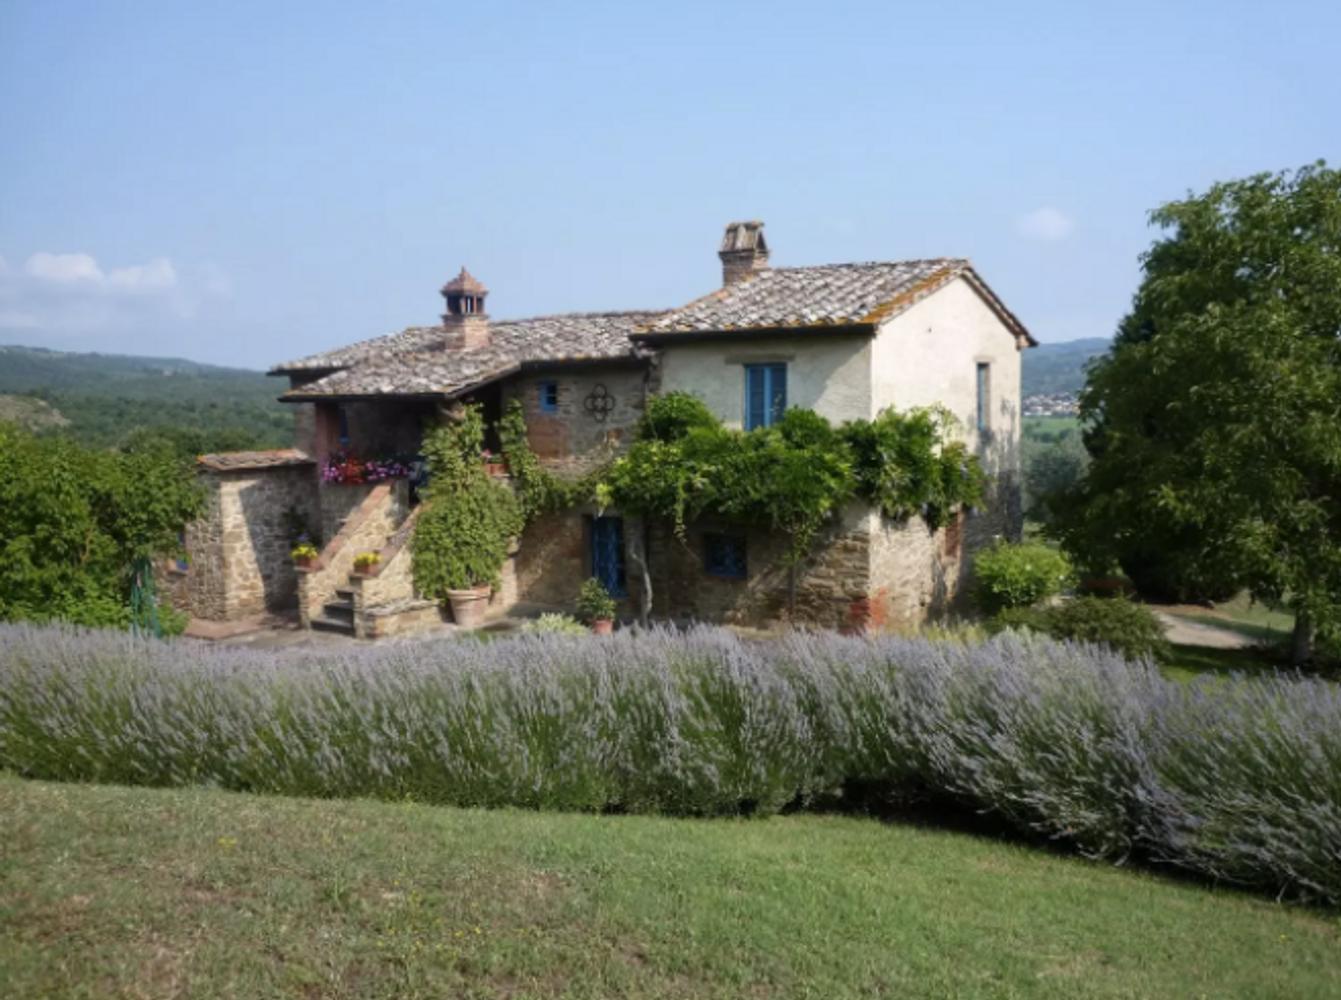 Return to Love: Reclaim Joy in Tuscany